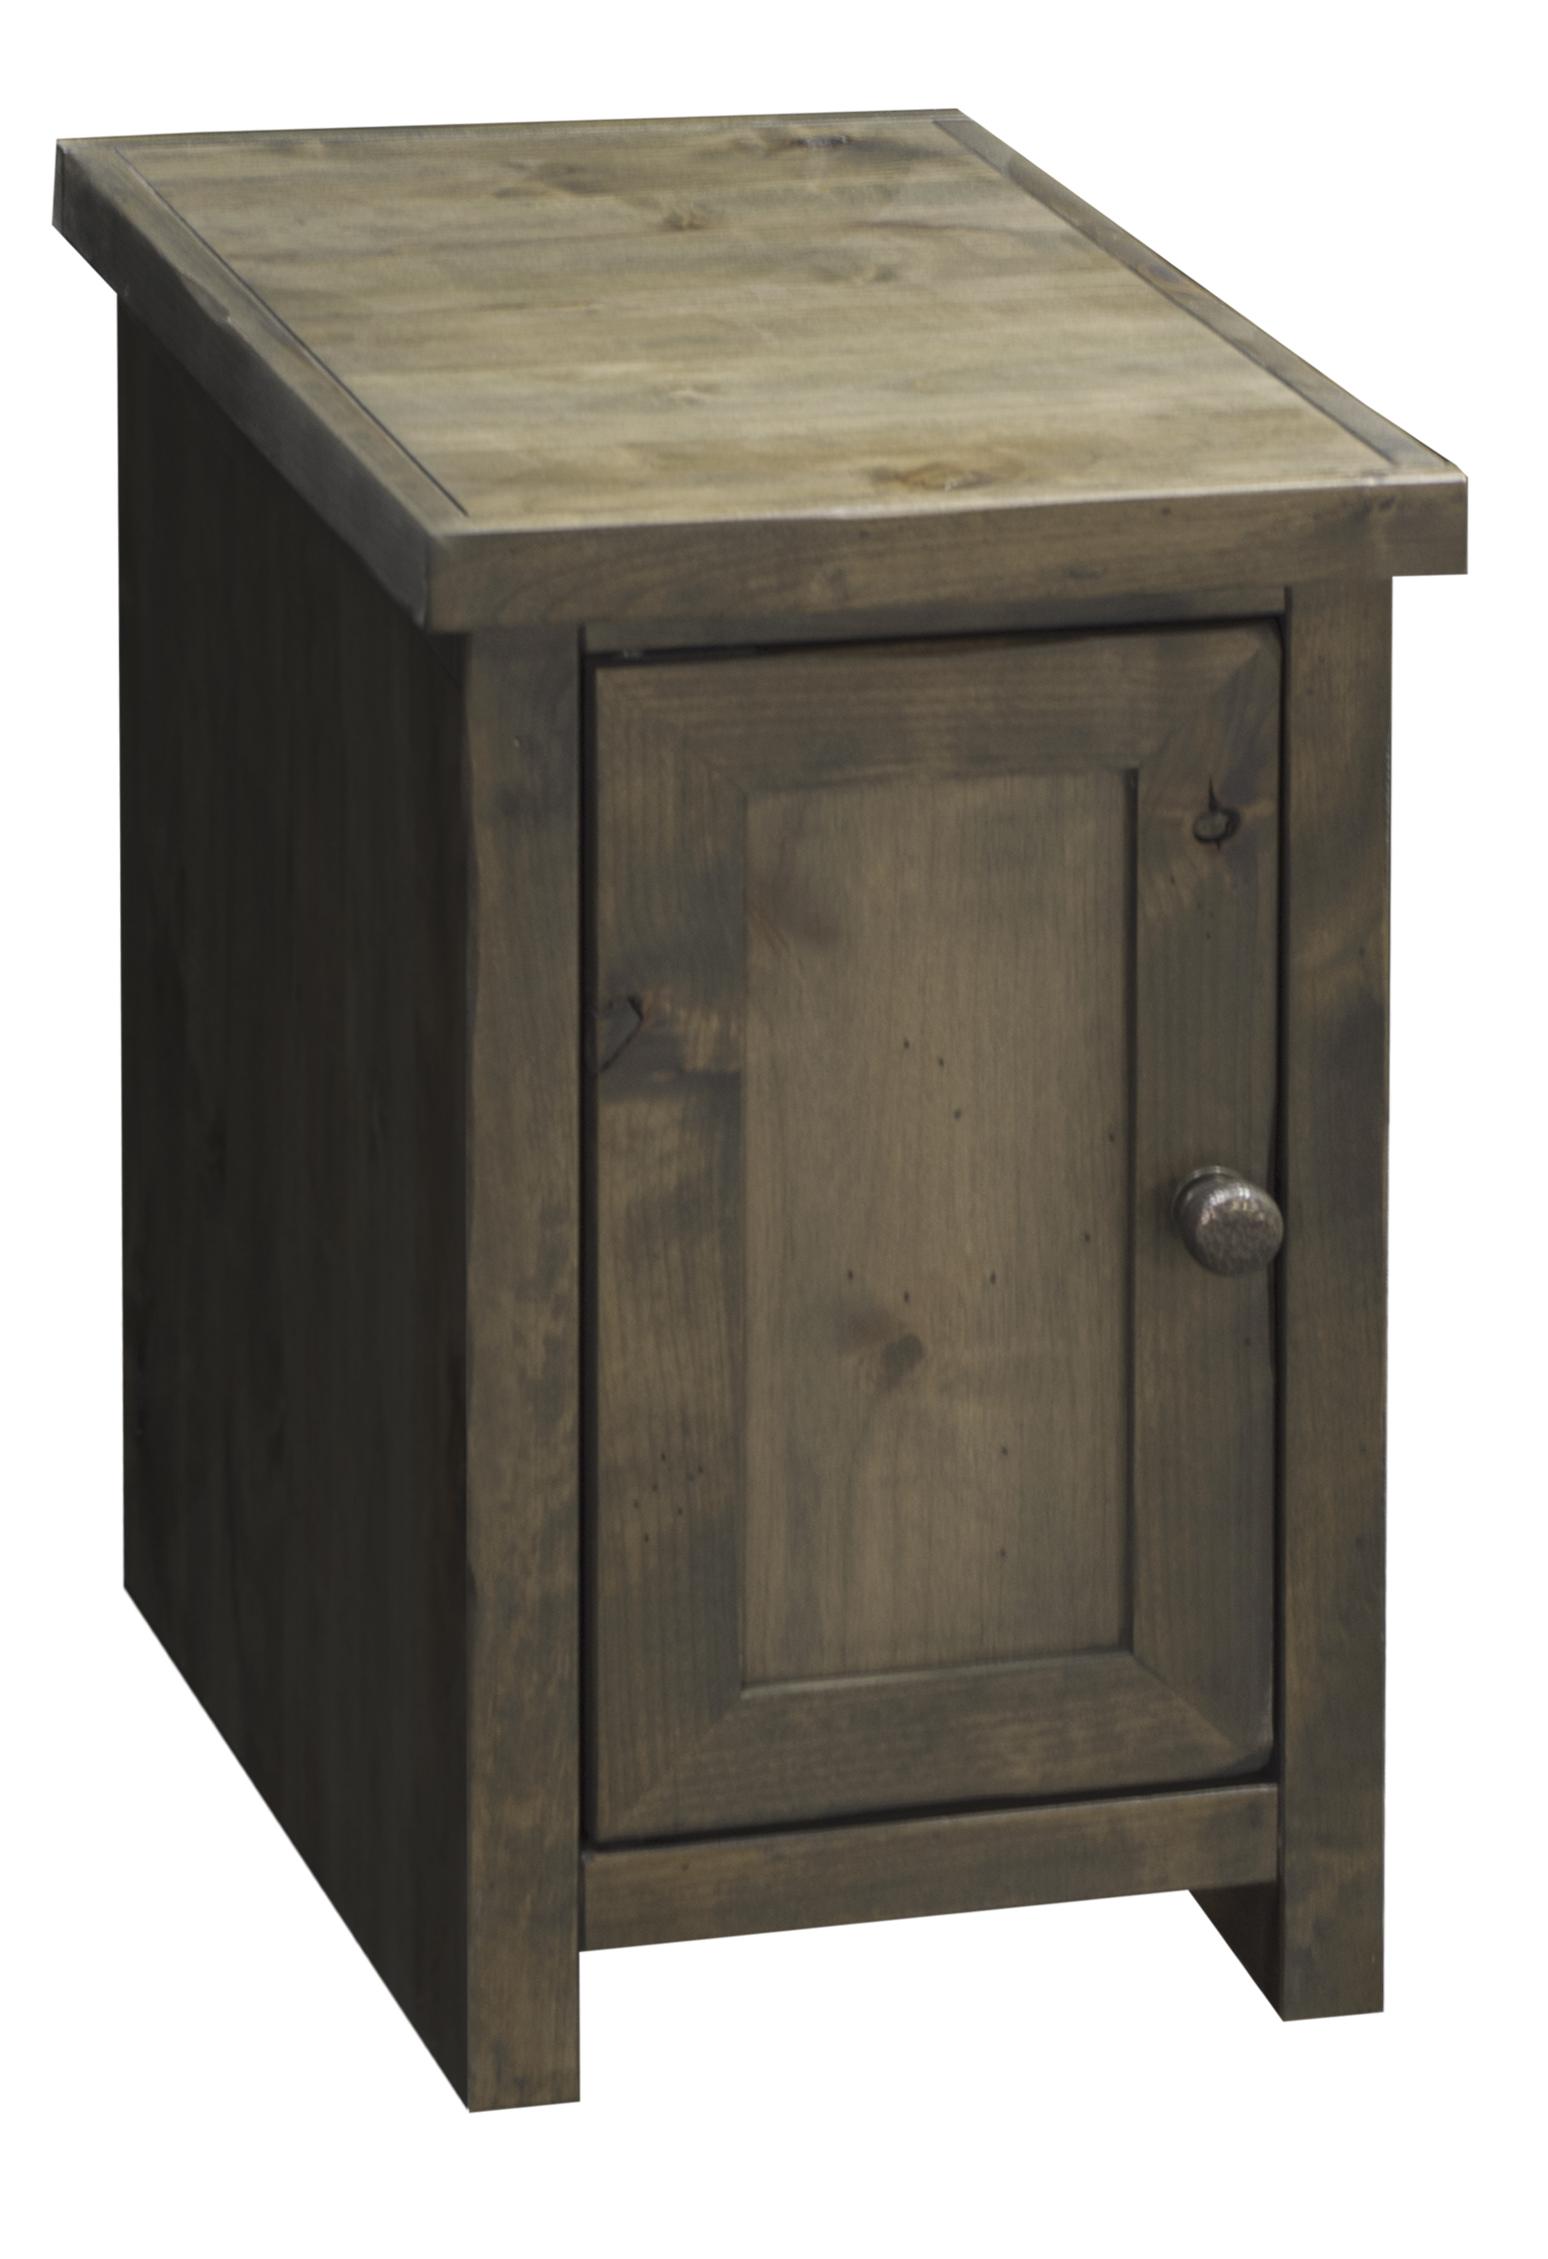 Legends Furniture Joshua Creek Joshua Creek Chair Side Table With Door